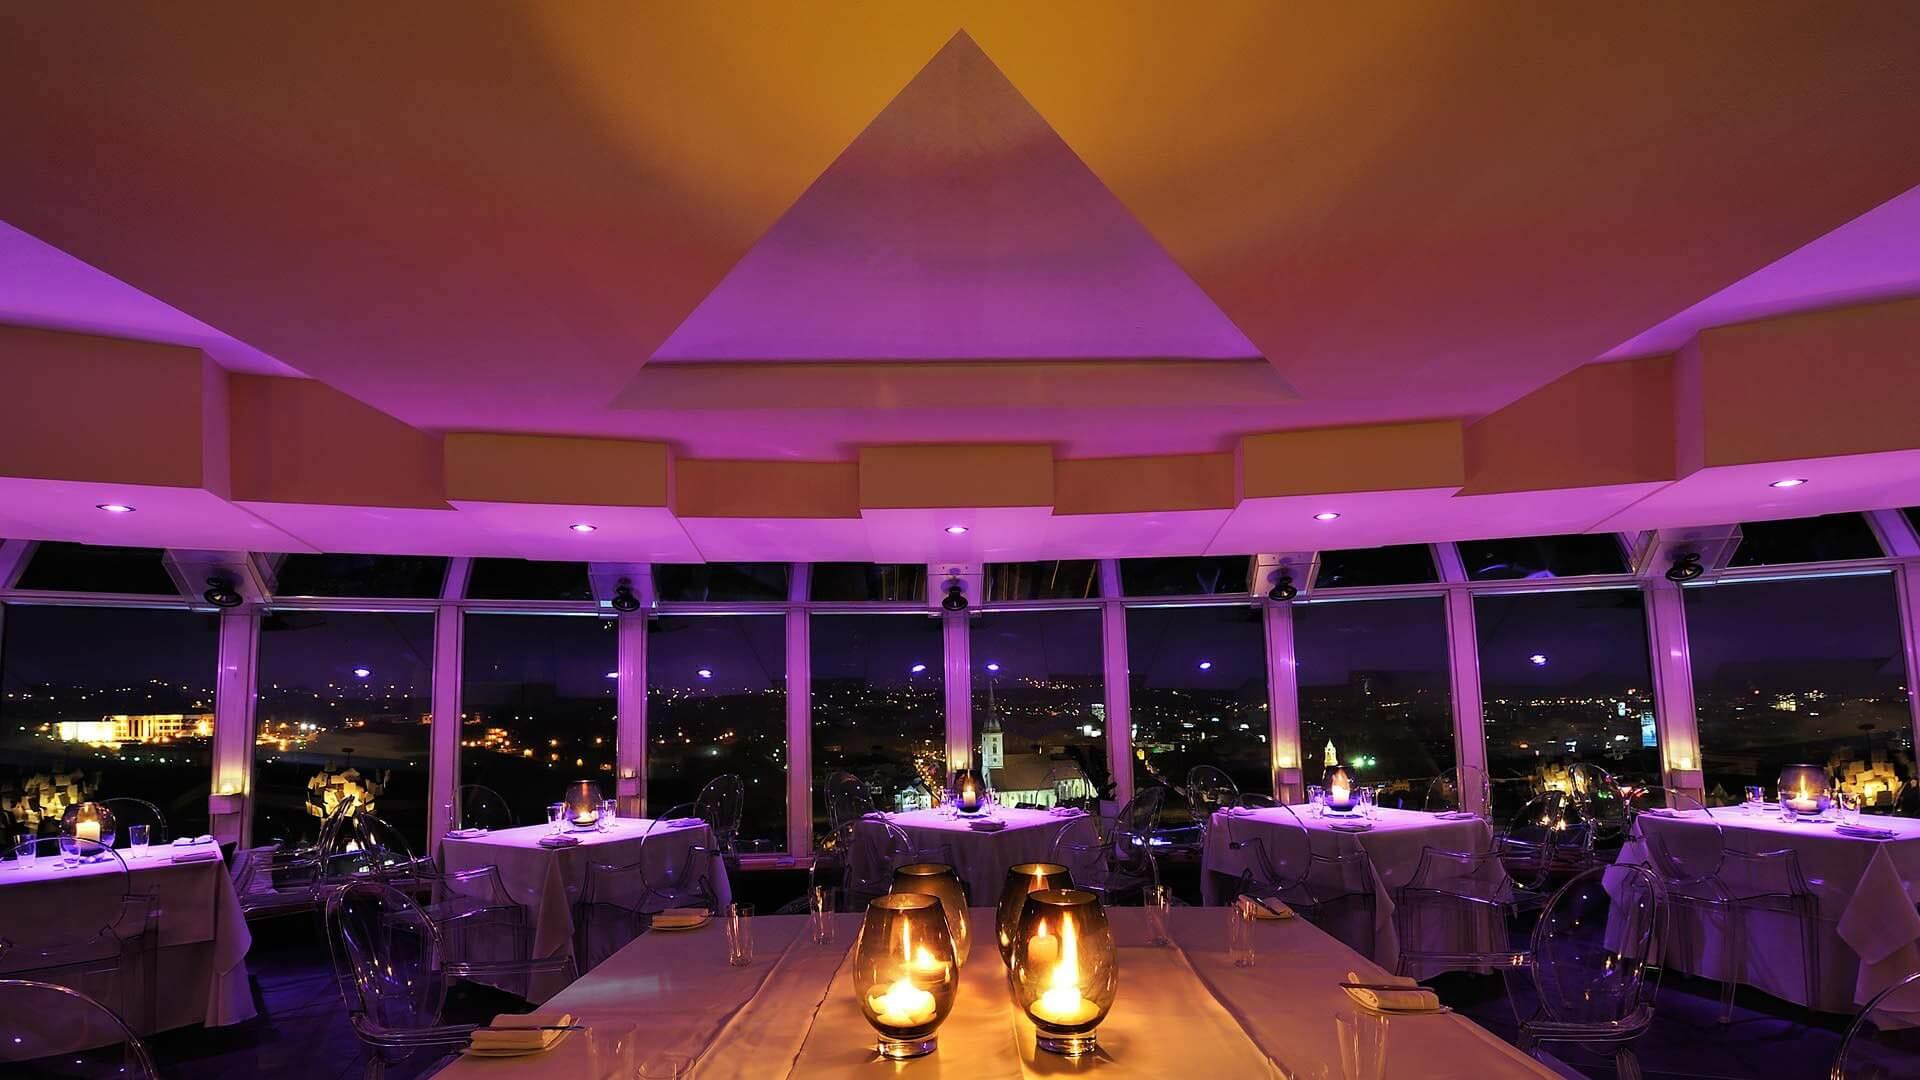 Ozvucenie UFO restaurant - MediaTech